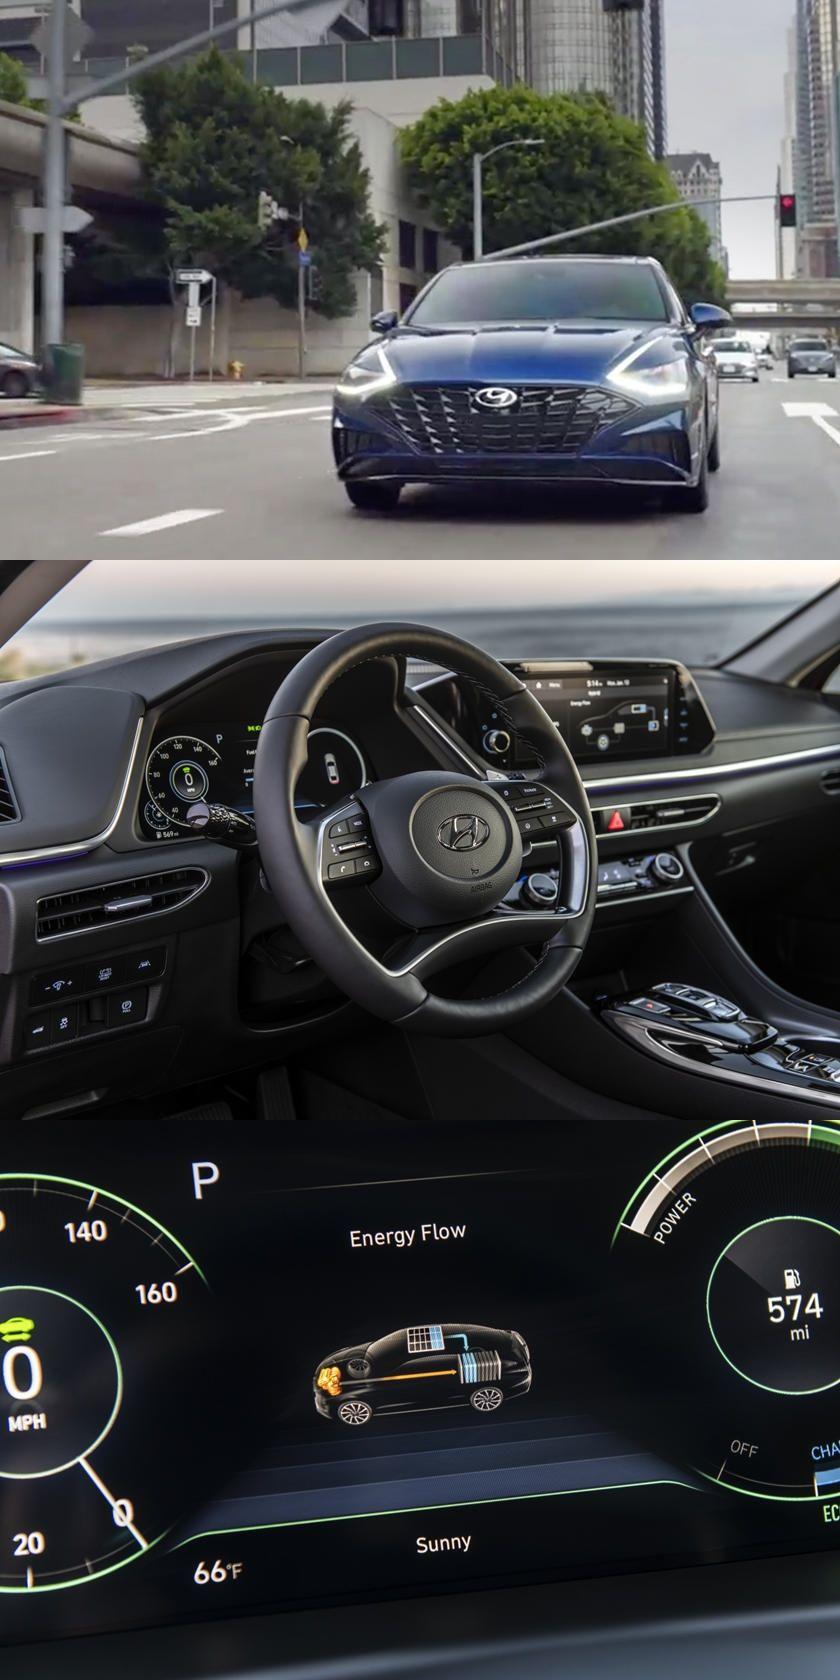 2020 Hyundai Sonata Hybrid Lands With 686 Miles Of Range The Honda Accord Hybrid May Have Finally Met Its Match In 2020 Hyundai Sonata